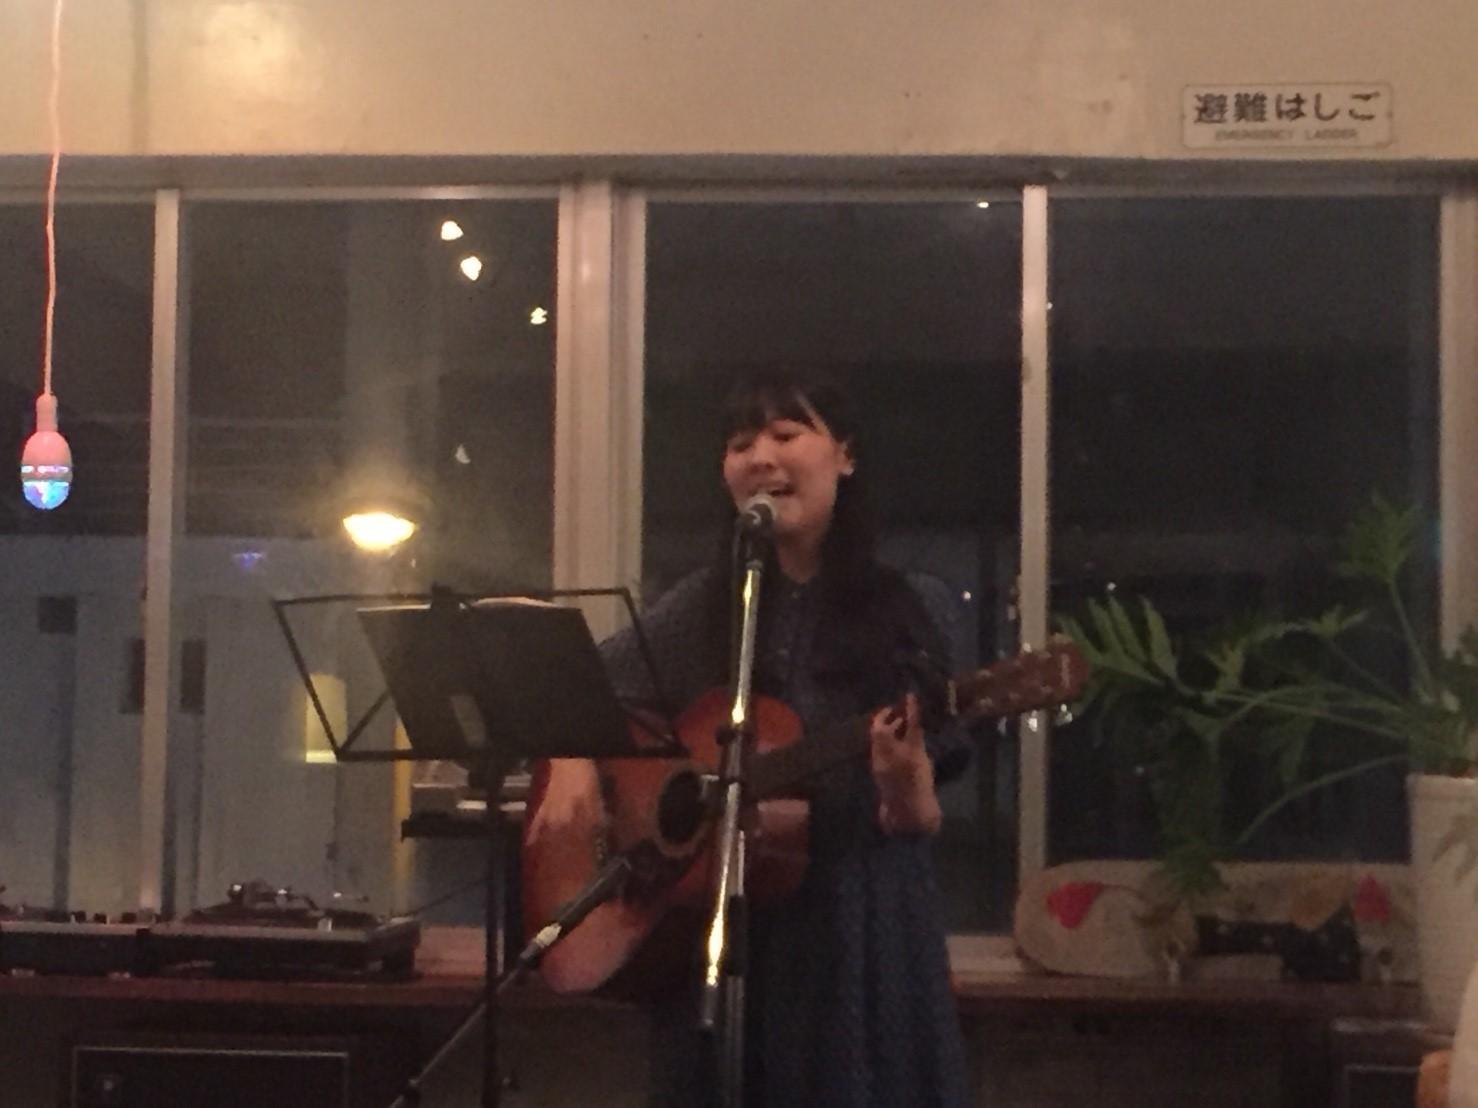 Luz × 鳥取大学 ACOUSTIC LIVE @Luzcafe  レポ_e0115904_15241641.jpg